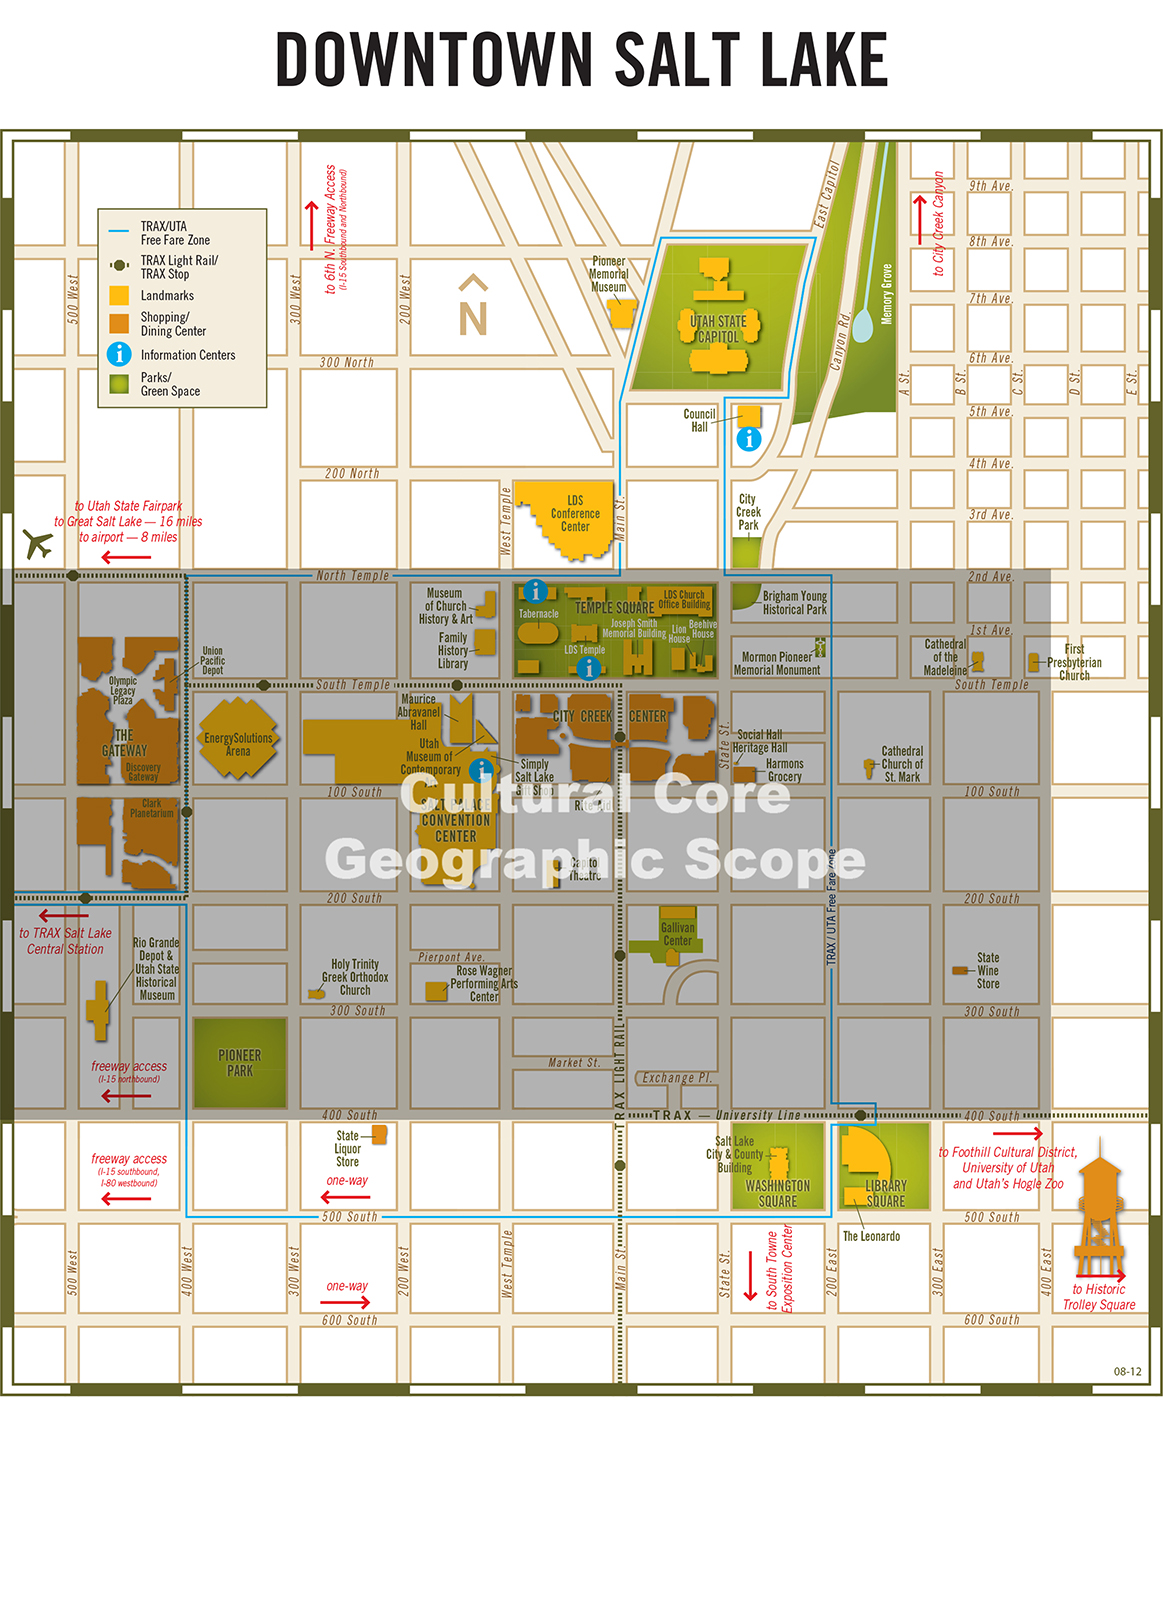 SaltLakeCulturalCoreActionPlan_GeographicScope_CourtesyEntrant.jpg